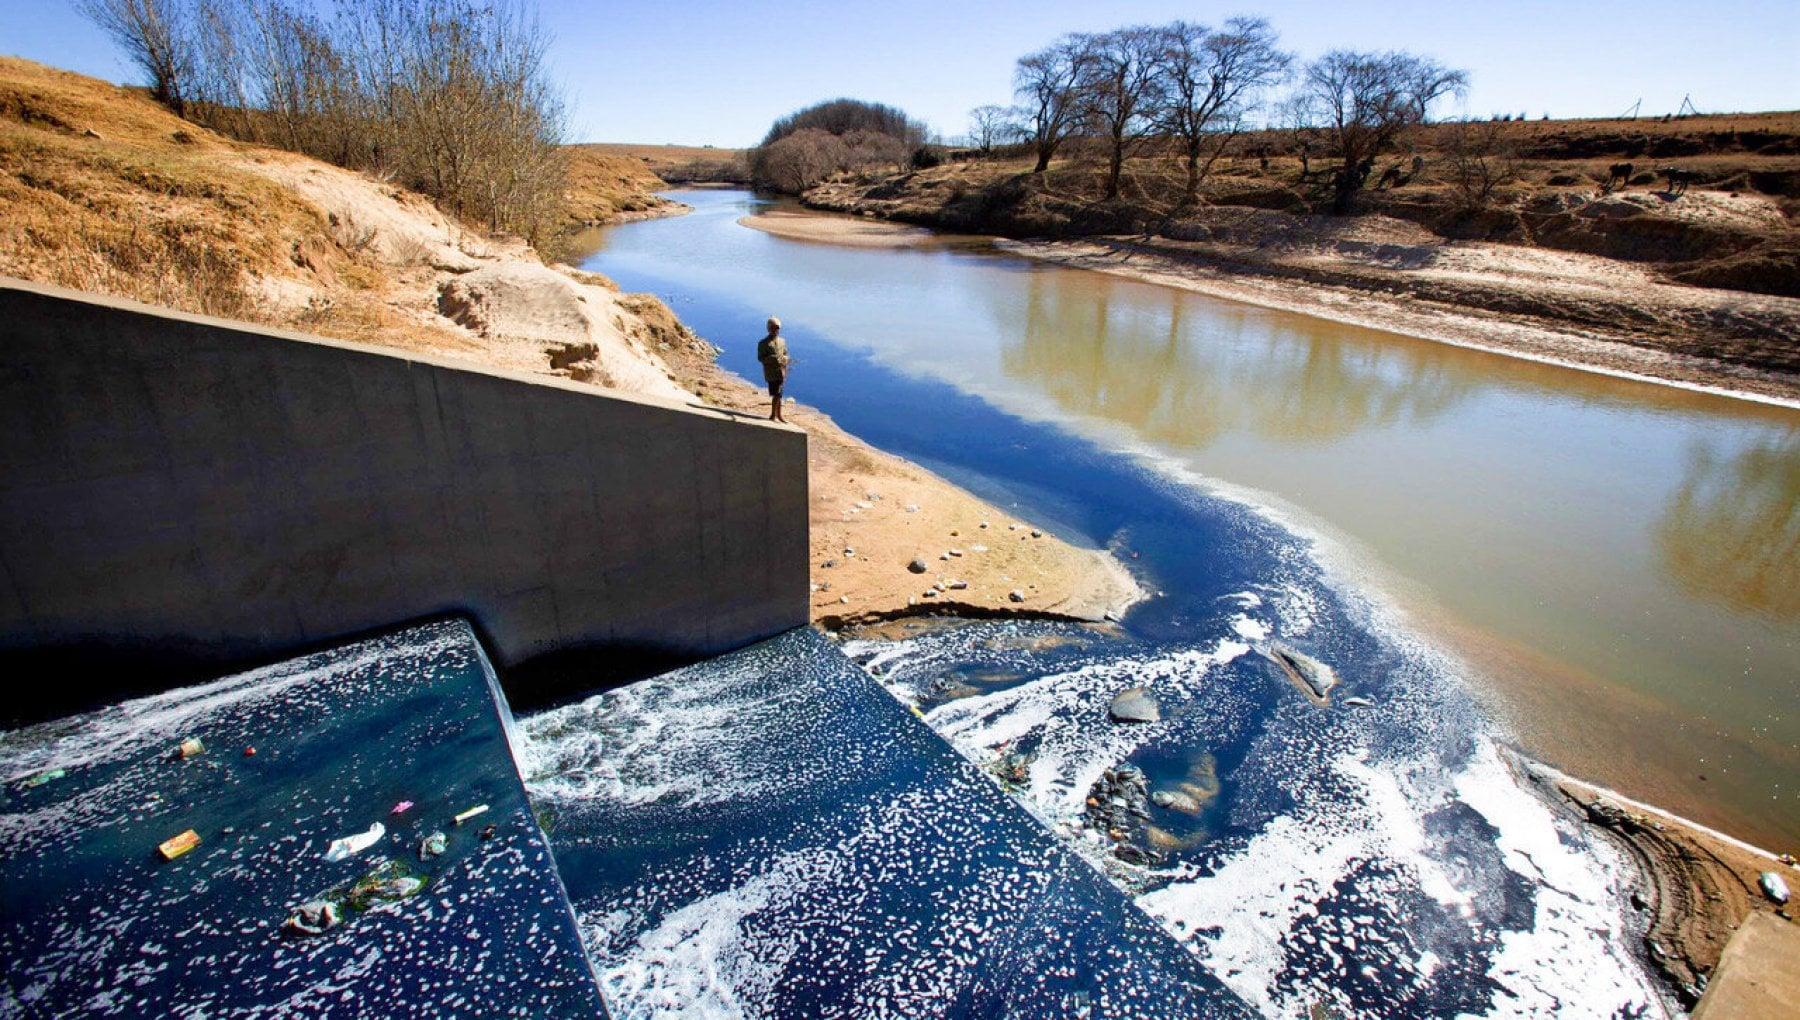 210422123 0270a751 f3cc 4028 9d5a 040338e02b04 - Acqua blu come i jeans, così la moda usa e getta inquina i fiumi africani